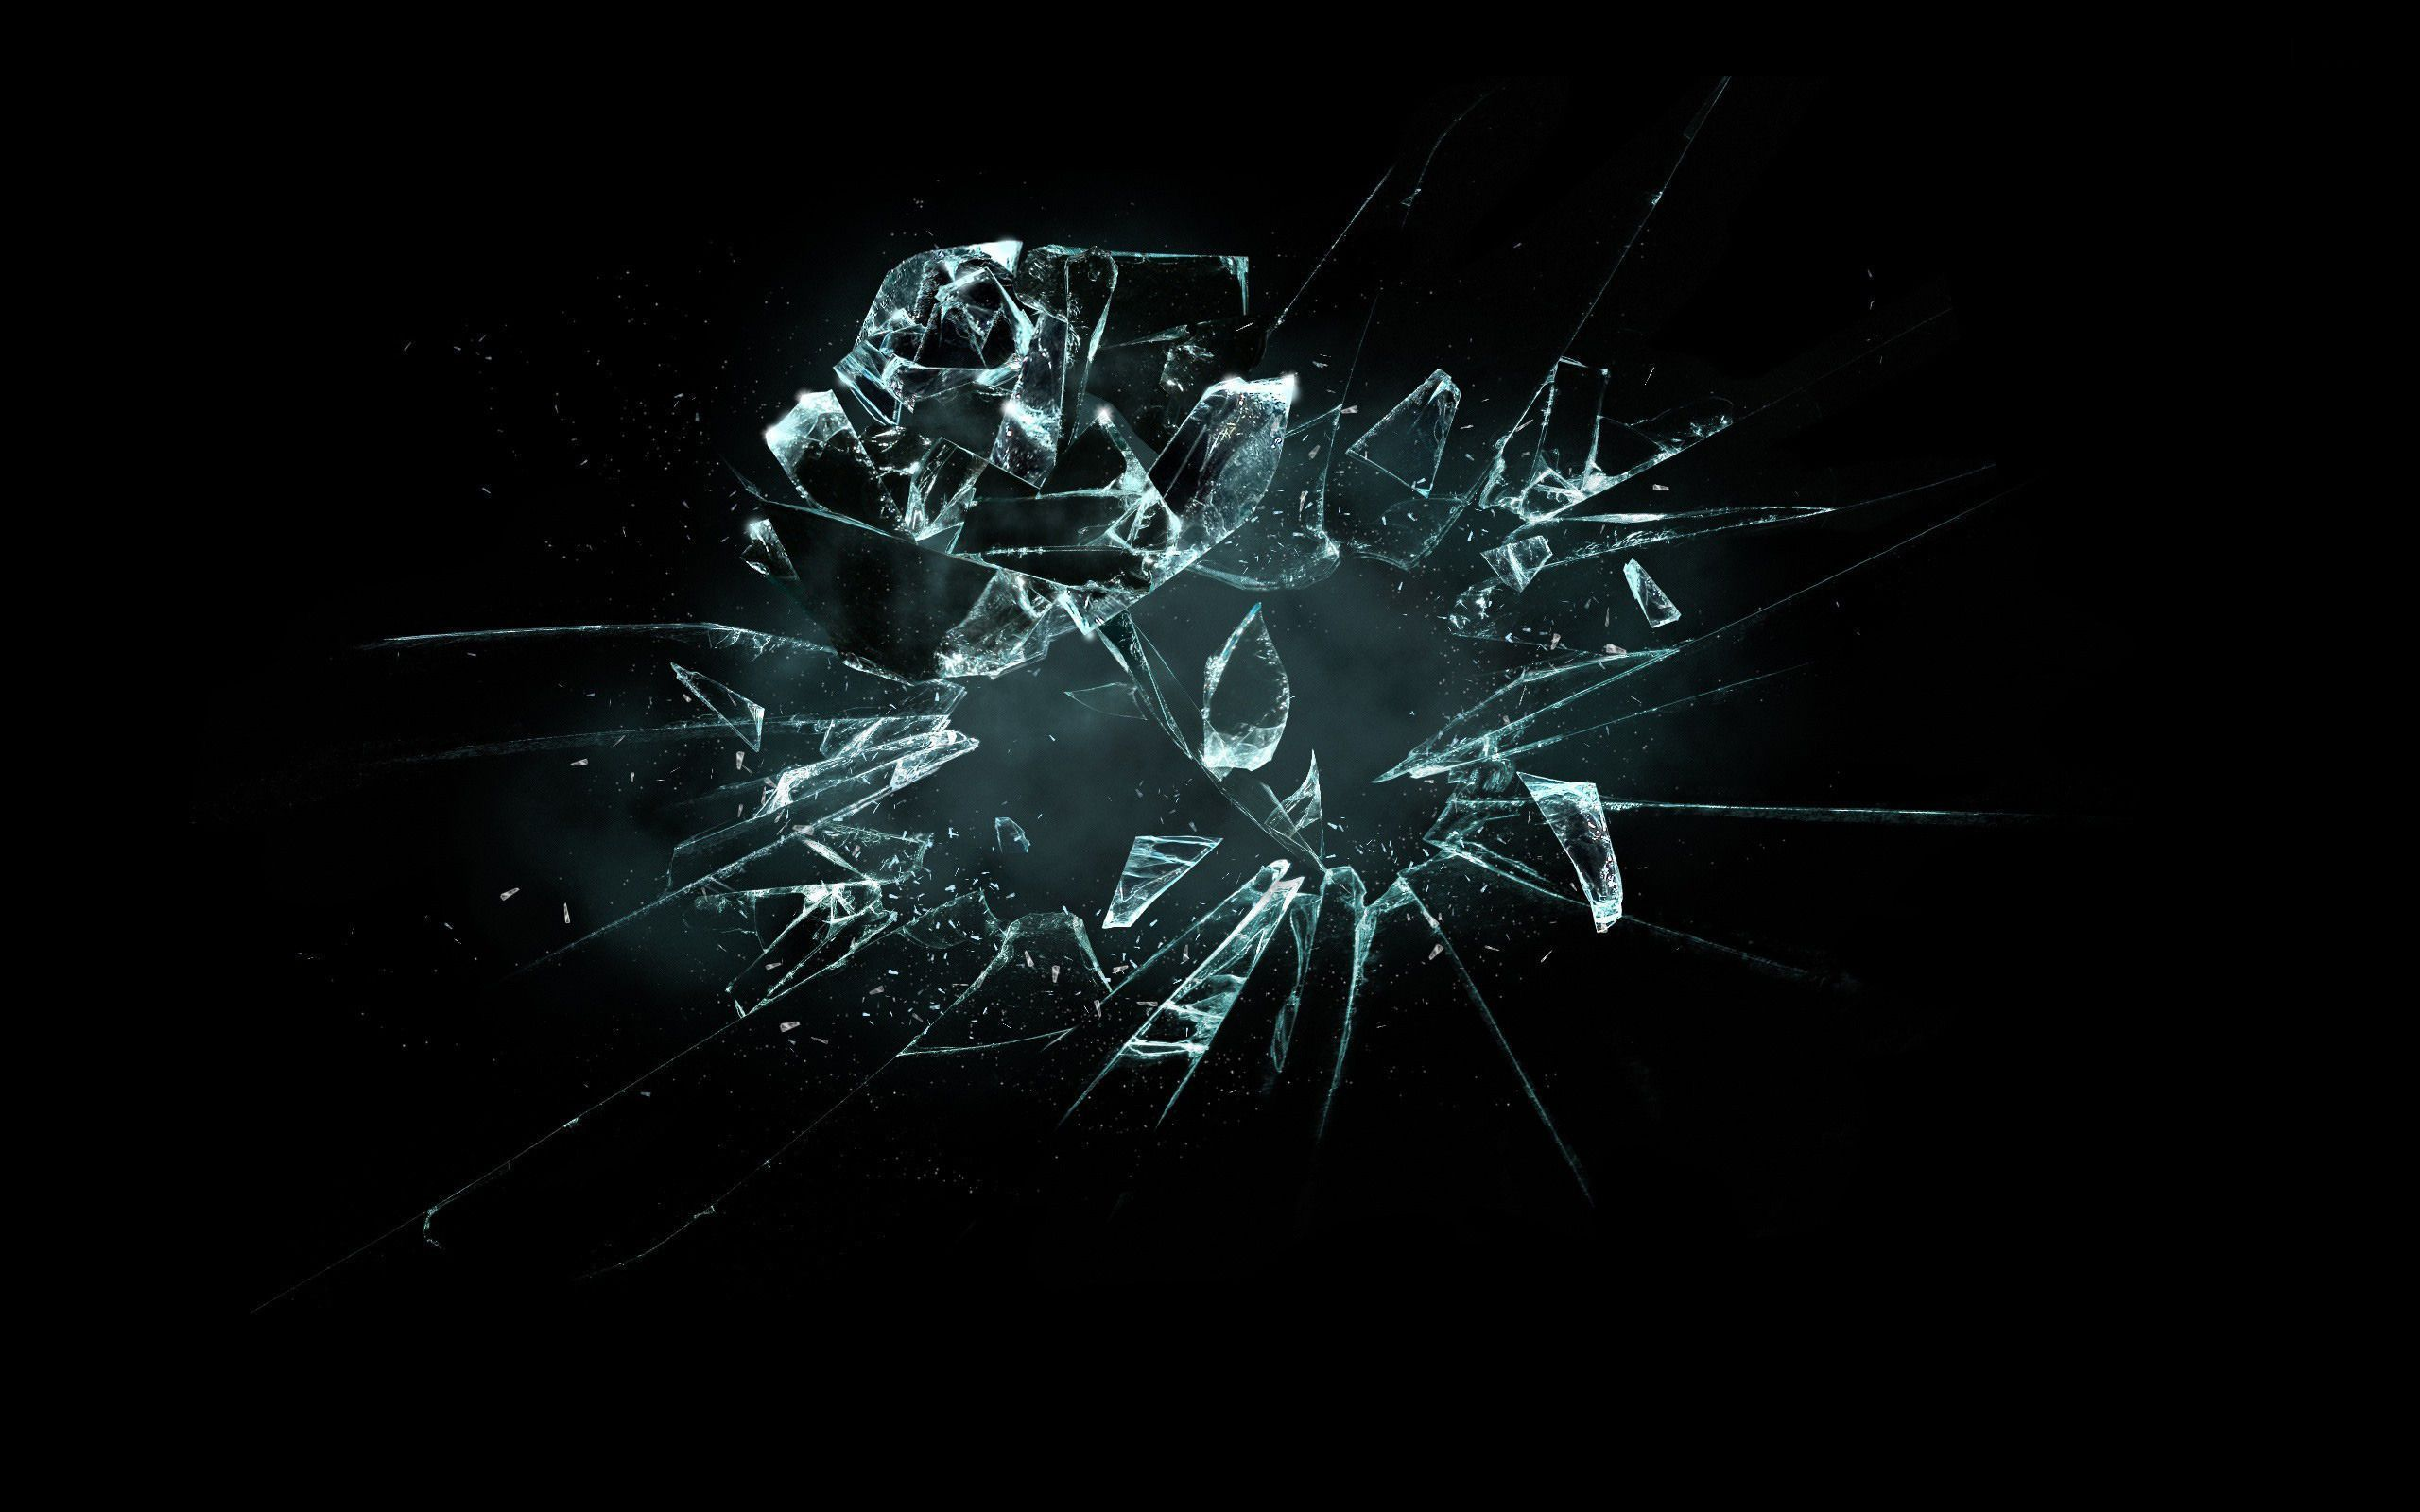 broken glass wallpapers photo | abstract wallpapers | pinterest